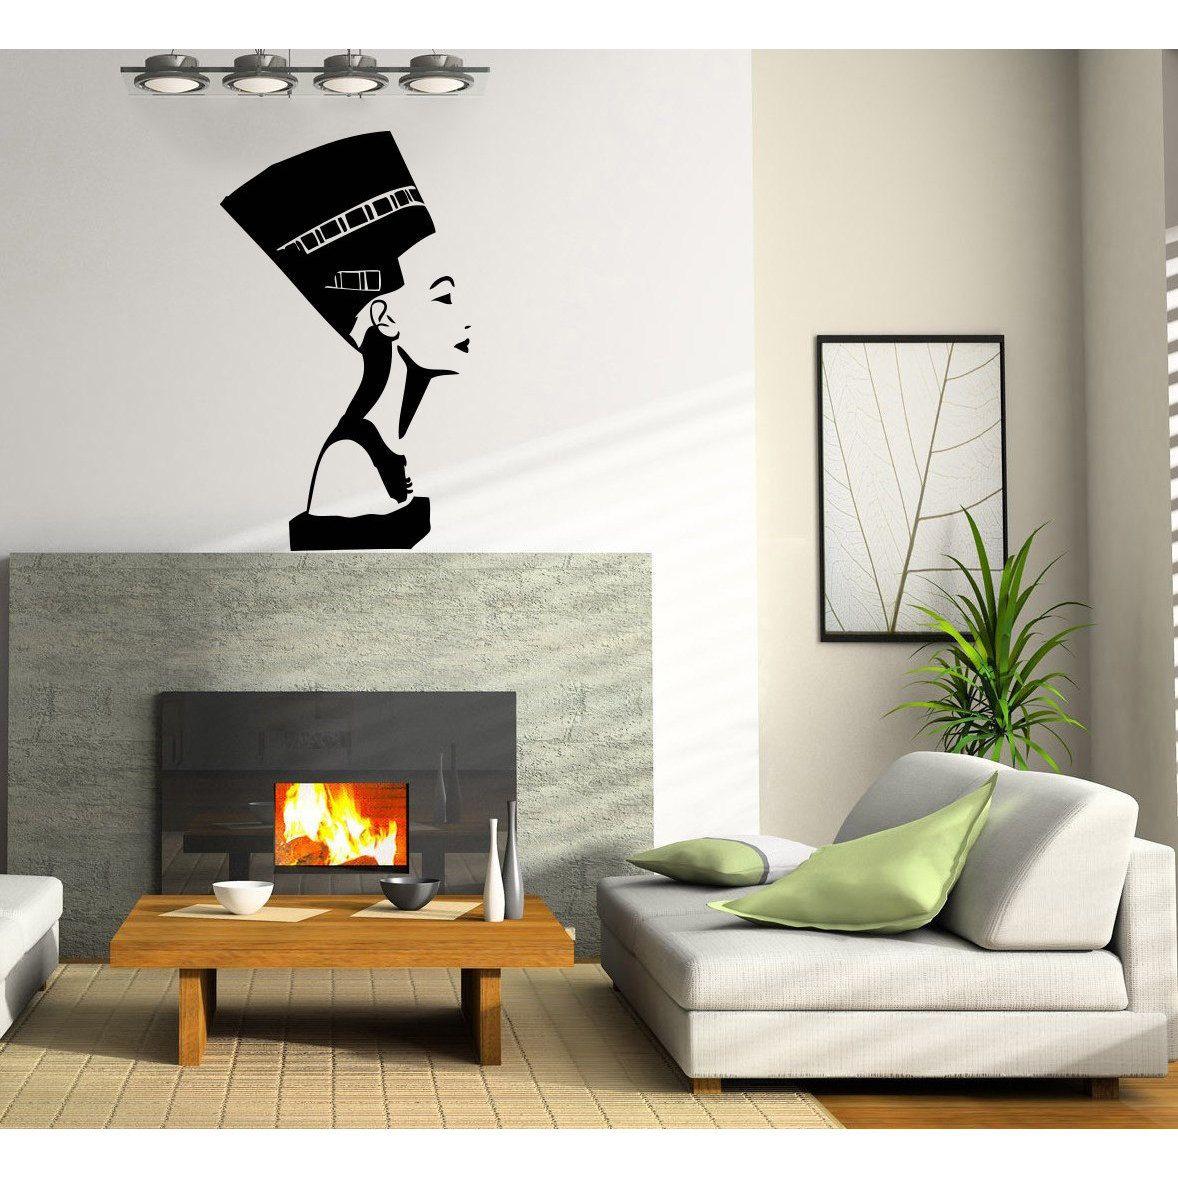 Nefertiti Egyptian Vinyl Sticker Wall Art | Products | Pinterest ...